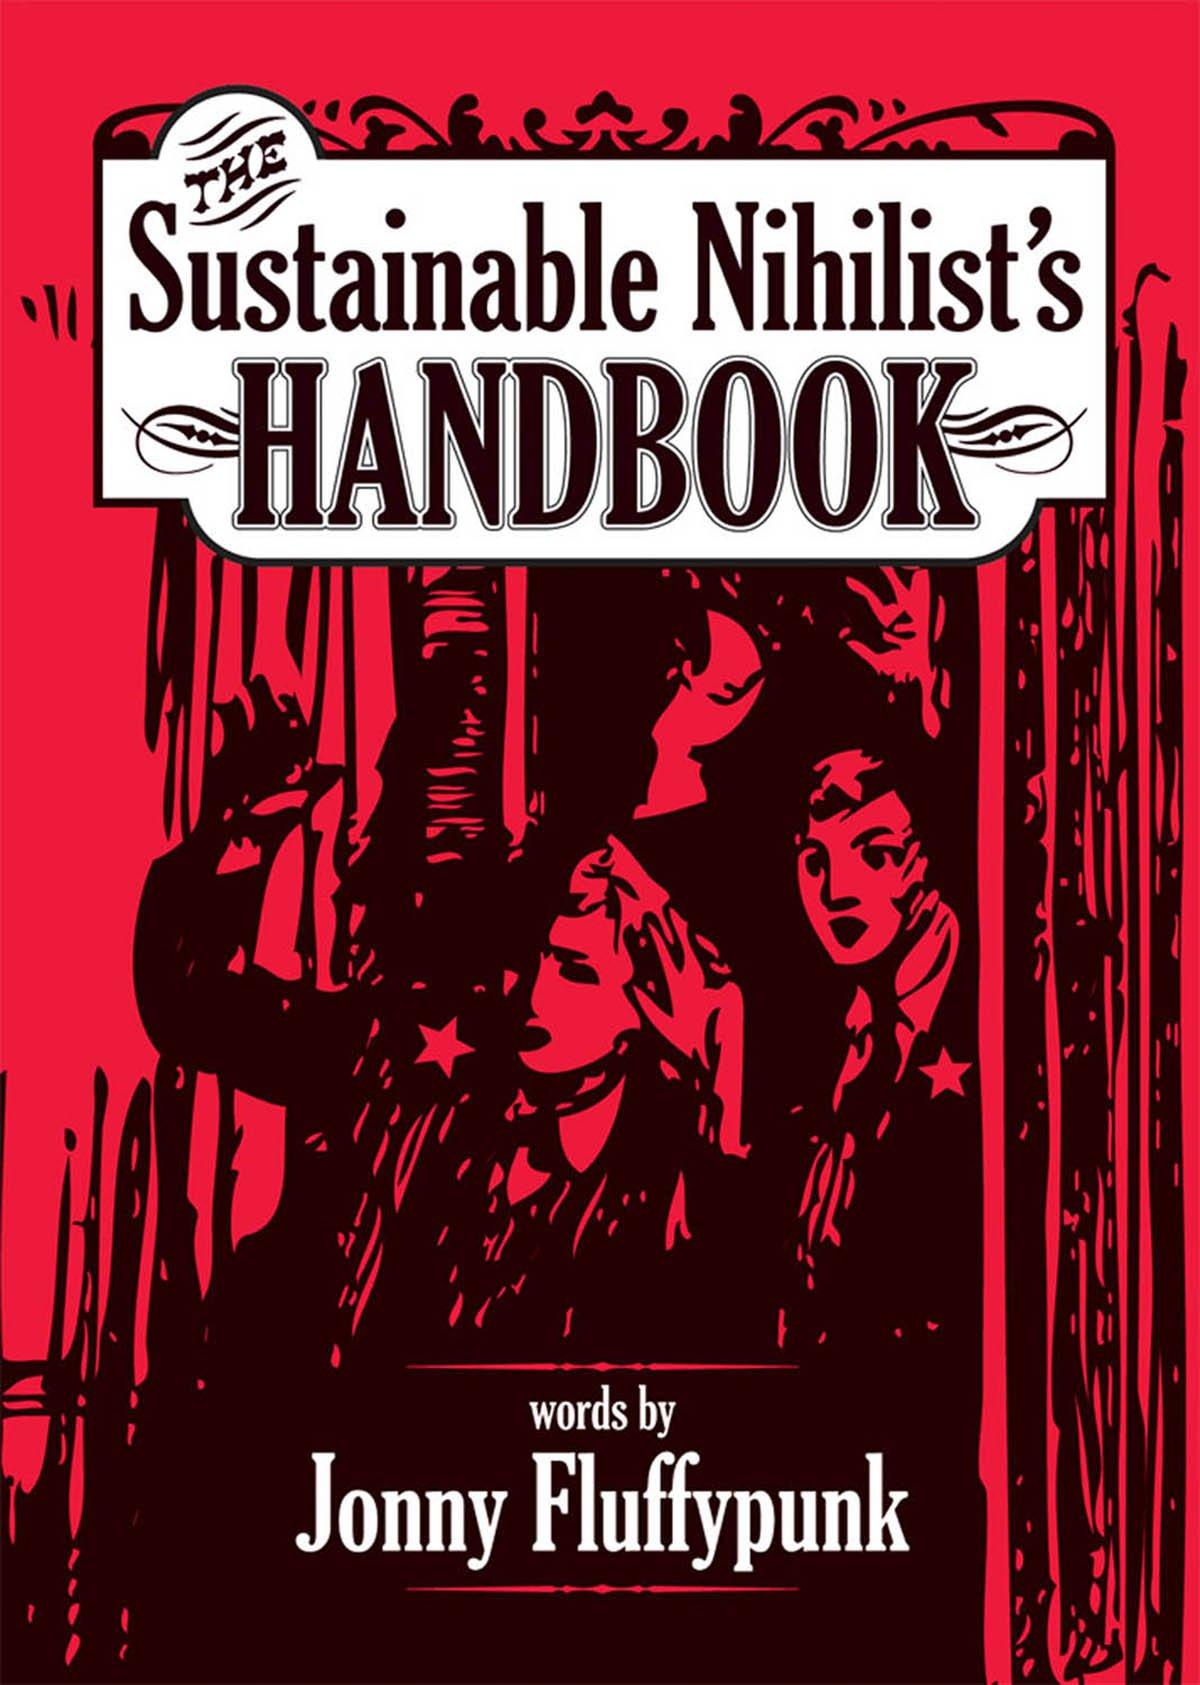 Image of The Sustainable Nihilist's Handbook by Jonny Fluffypunk